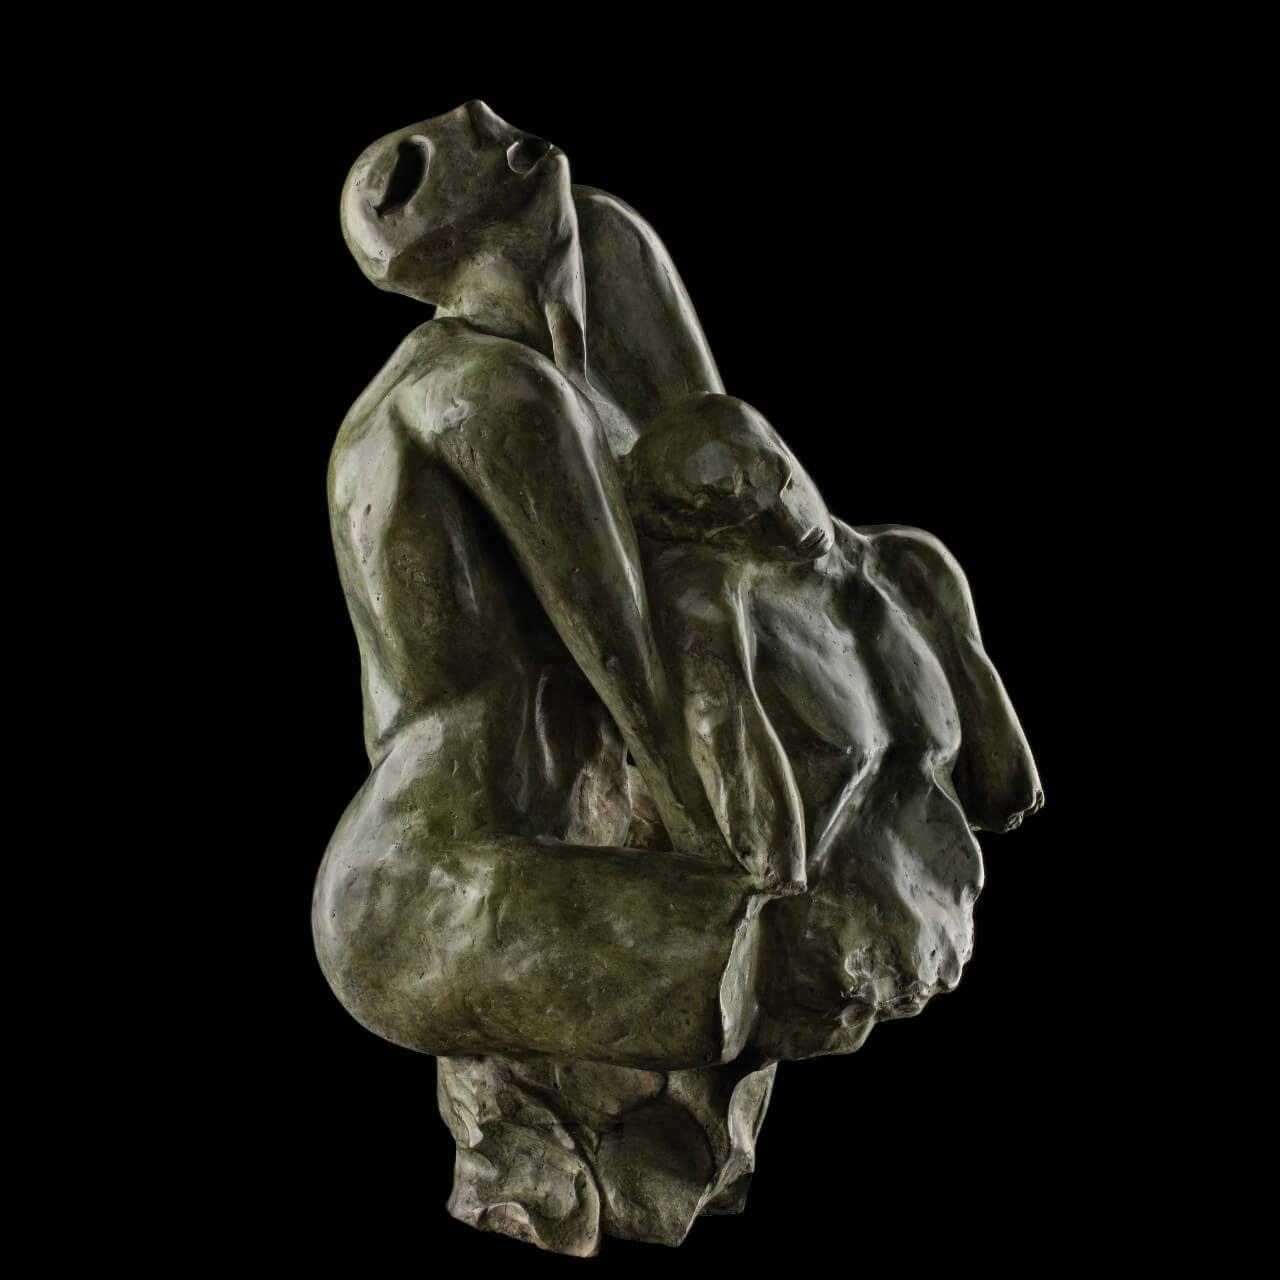 mario pavesi italian sculptur painter bronze female figure maternity